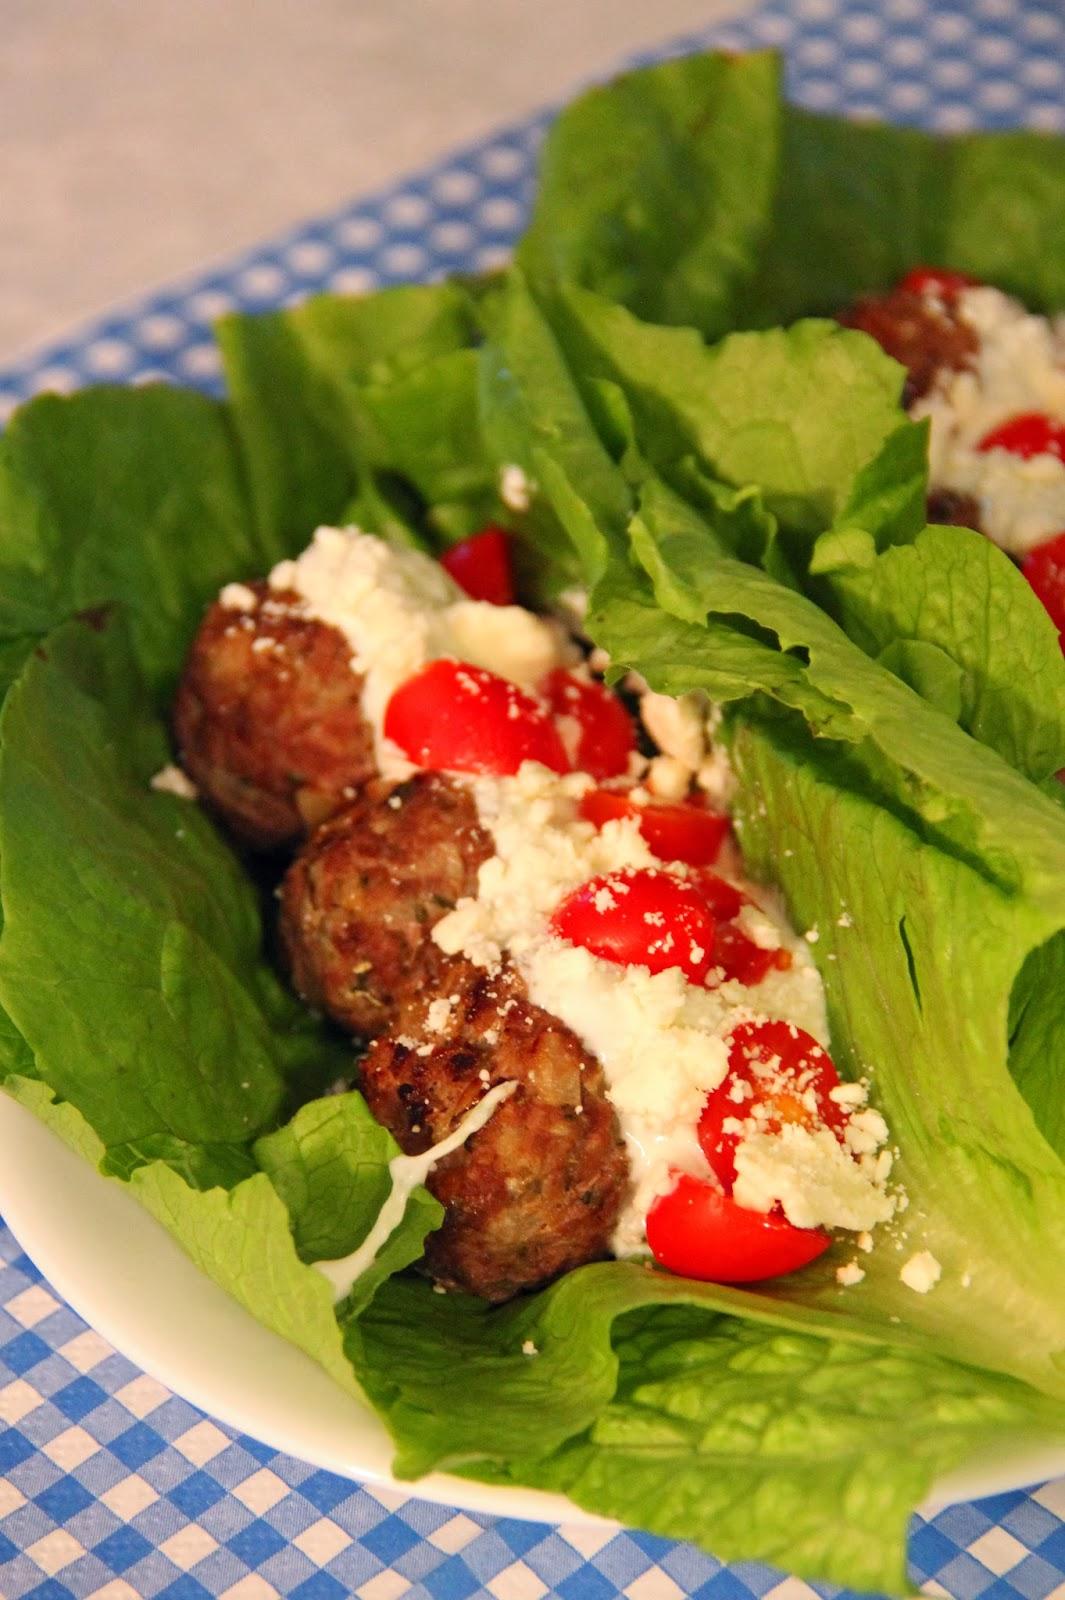 Jo and Sue: Greek Gyro Lettuce Wraps